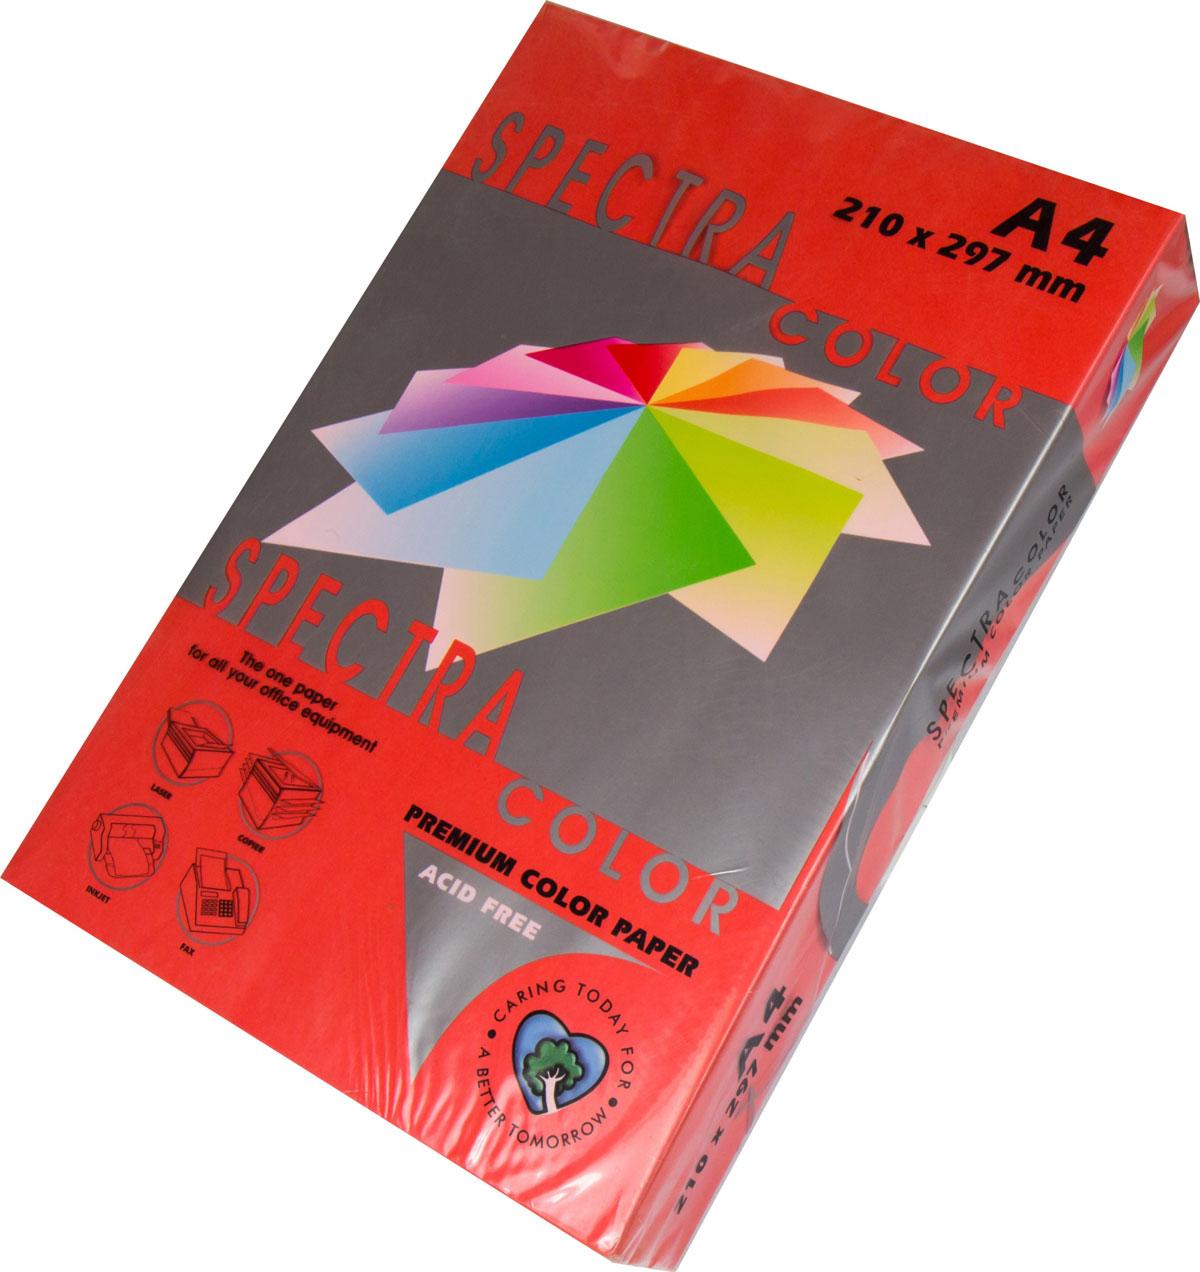 Бумага цветная Color A4 интенсив 80гр./м2. Red, 100листов, красн. Spectra Color - фото 1